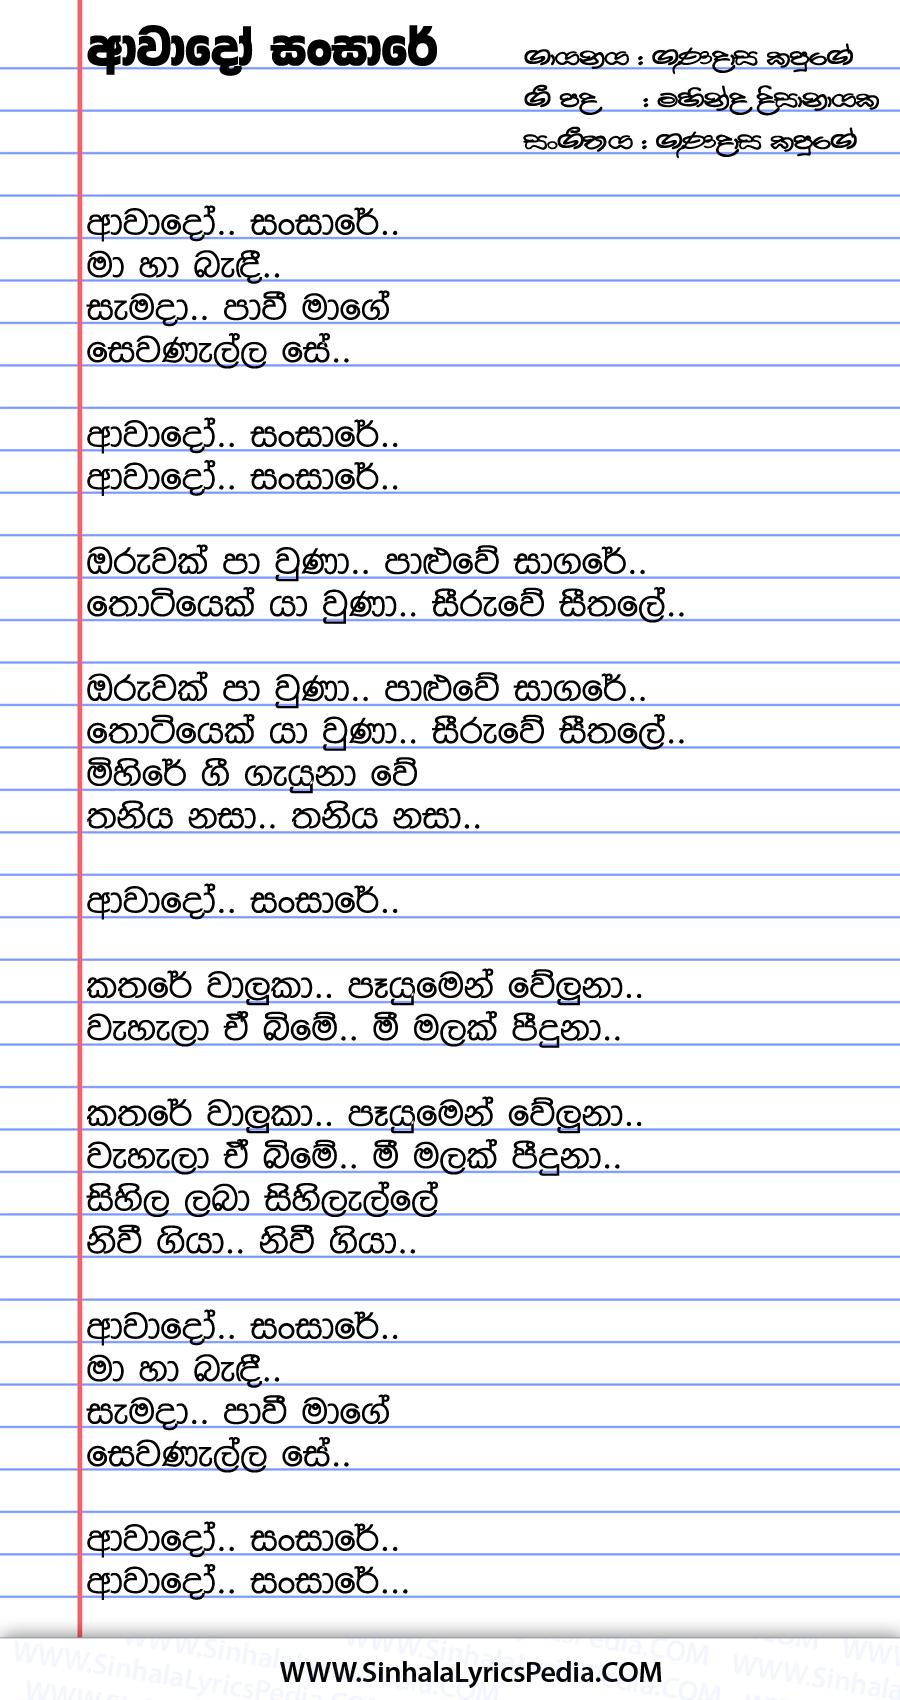 Awado Sansare Ma Ha Badi Samada Pawee Song Lyrics